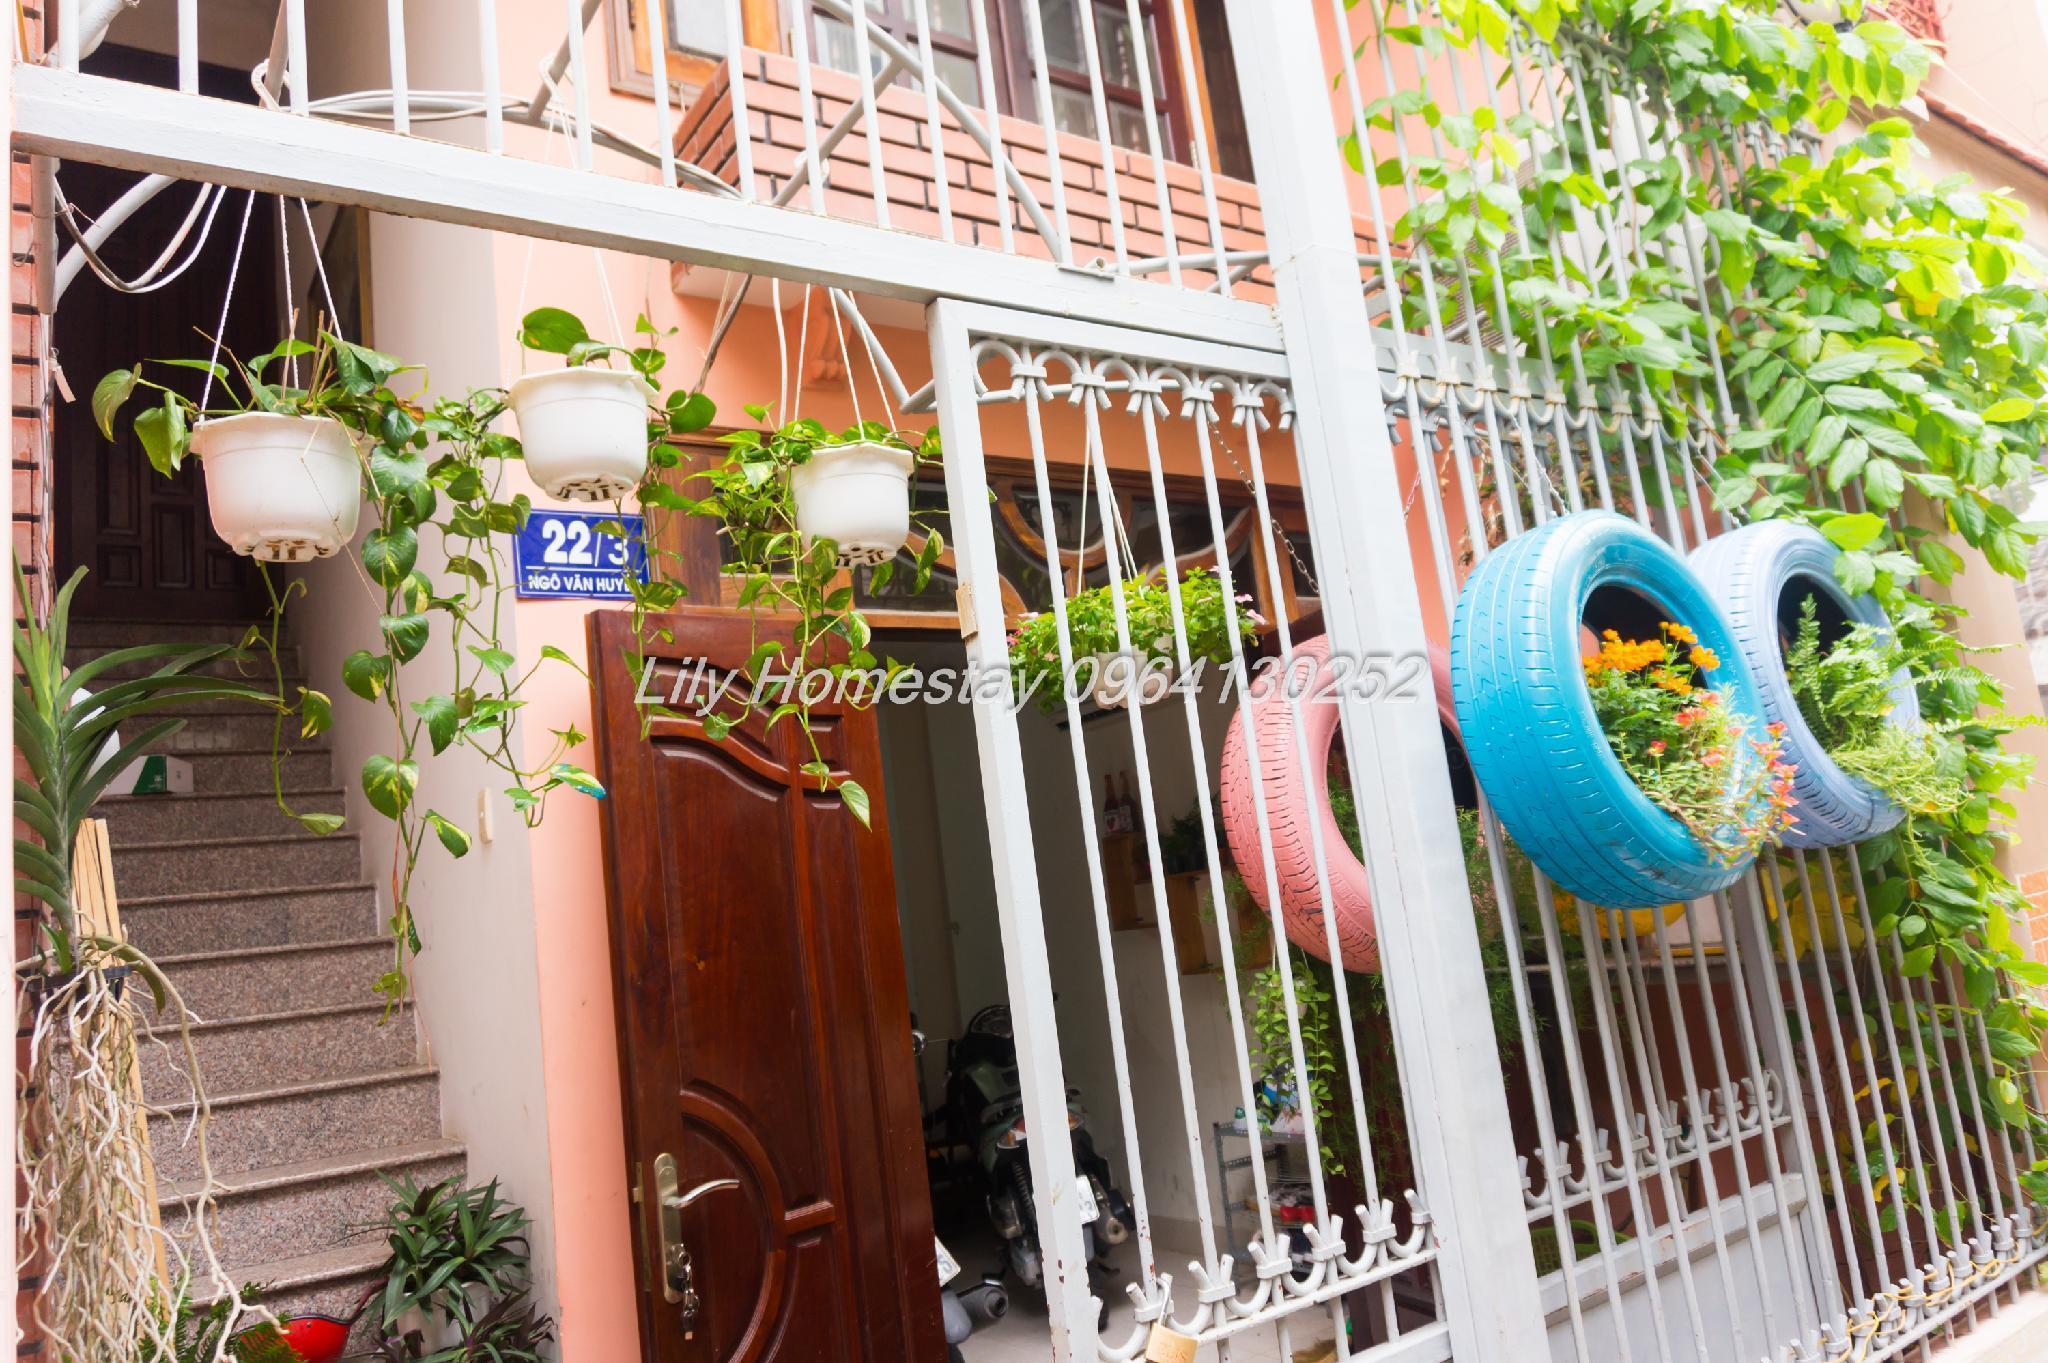 Lily Homestay Vung Tau - Full house